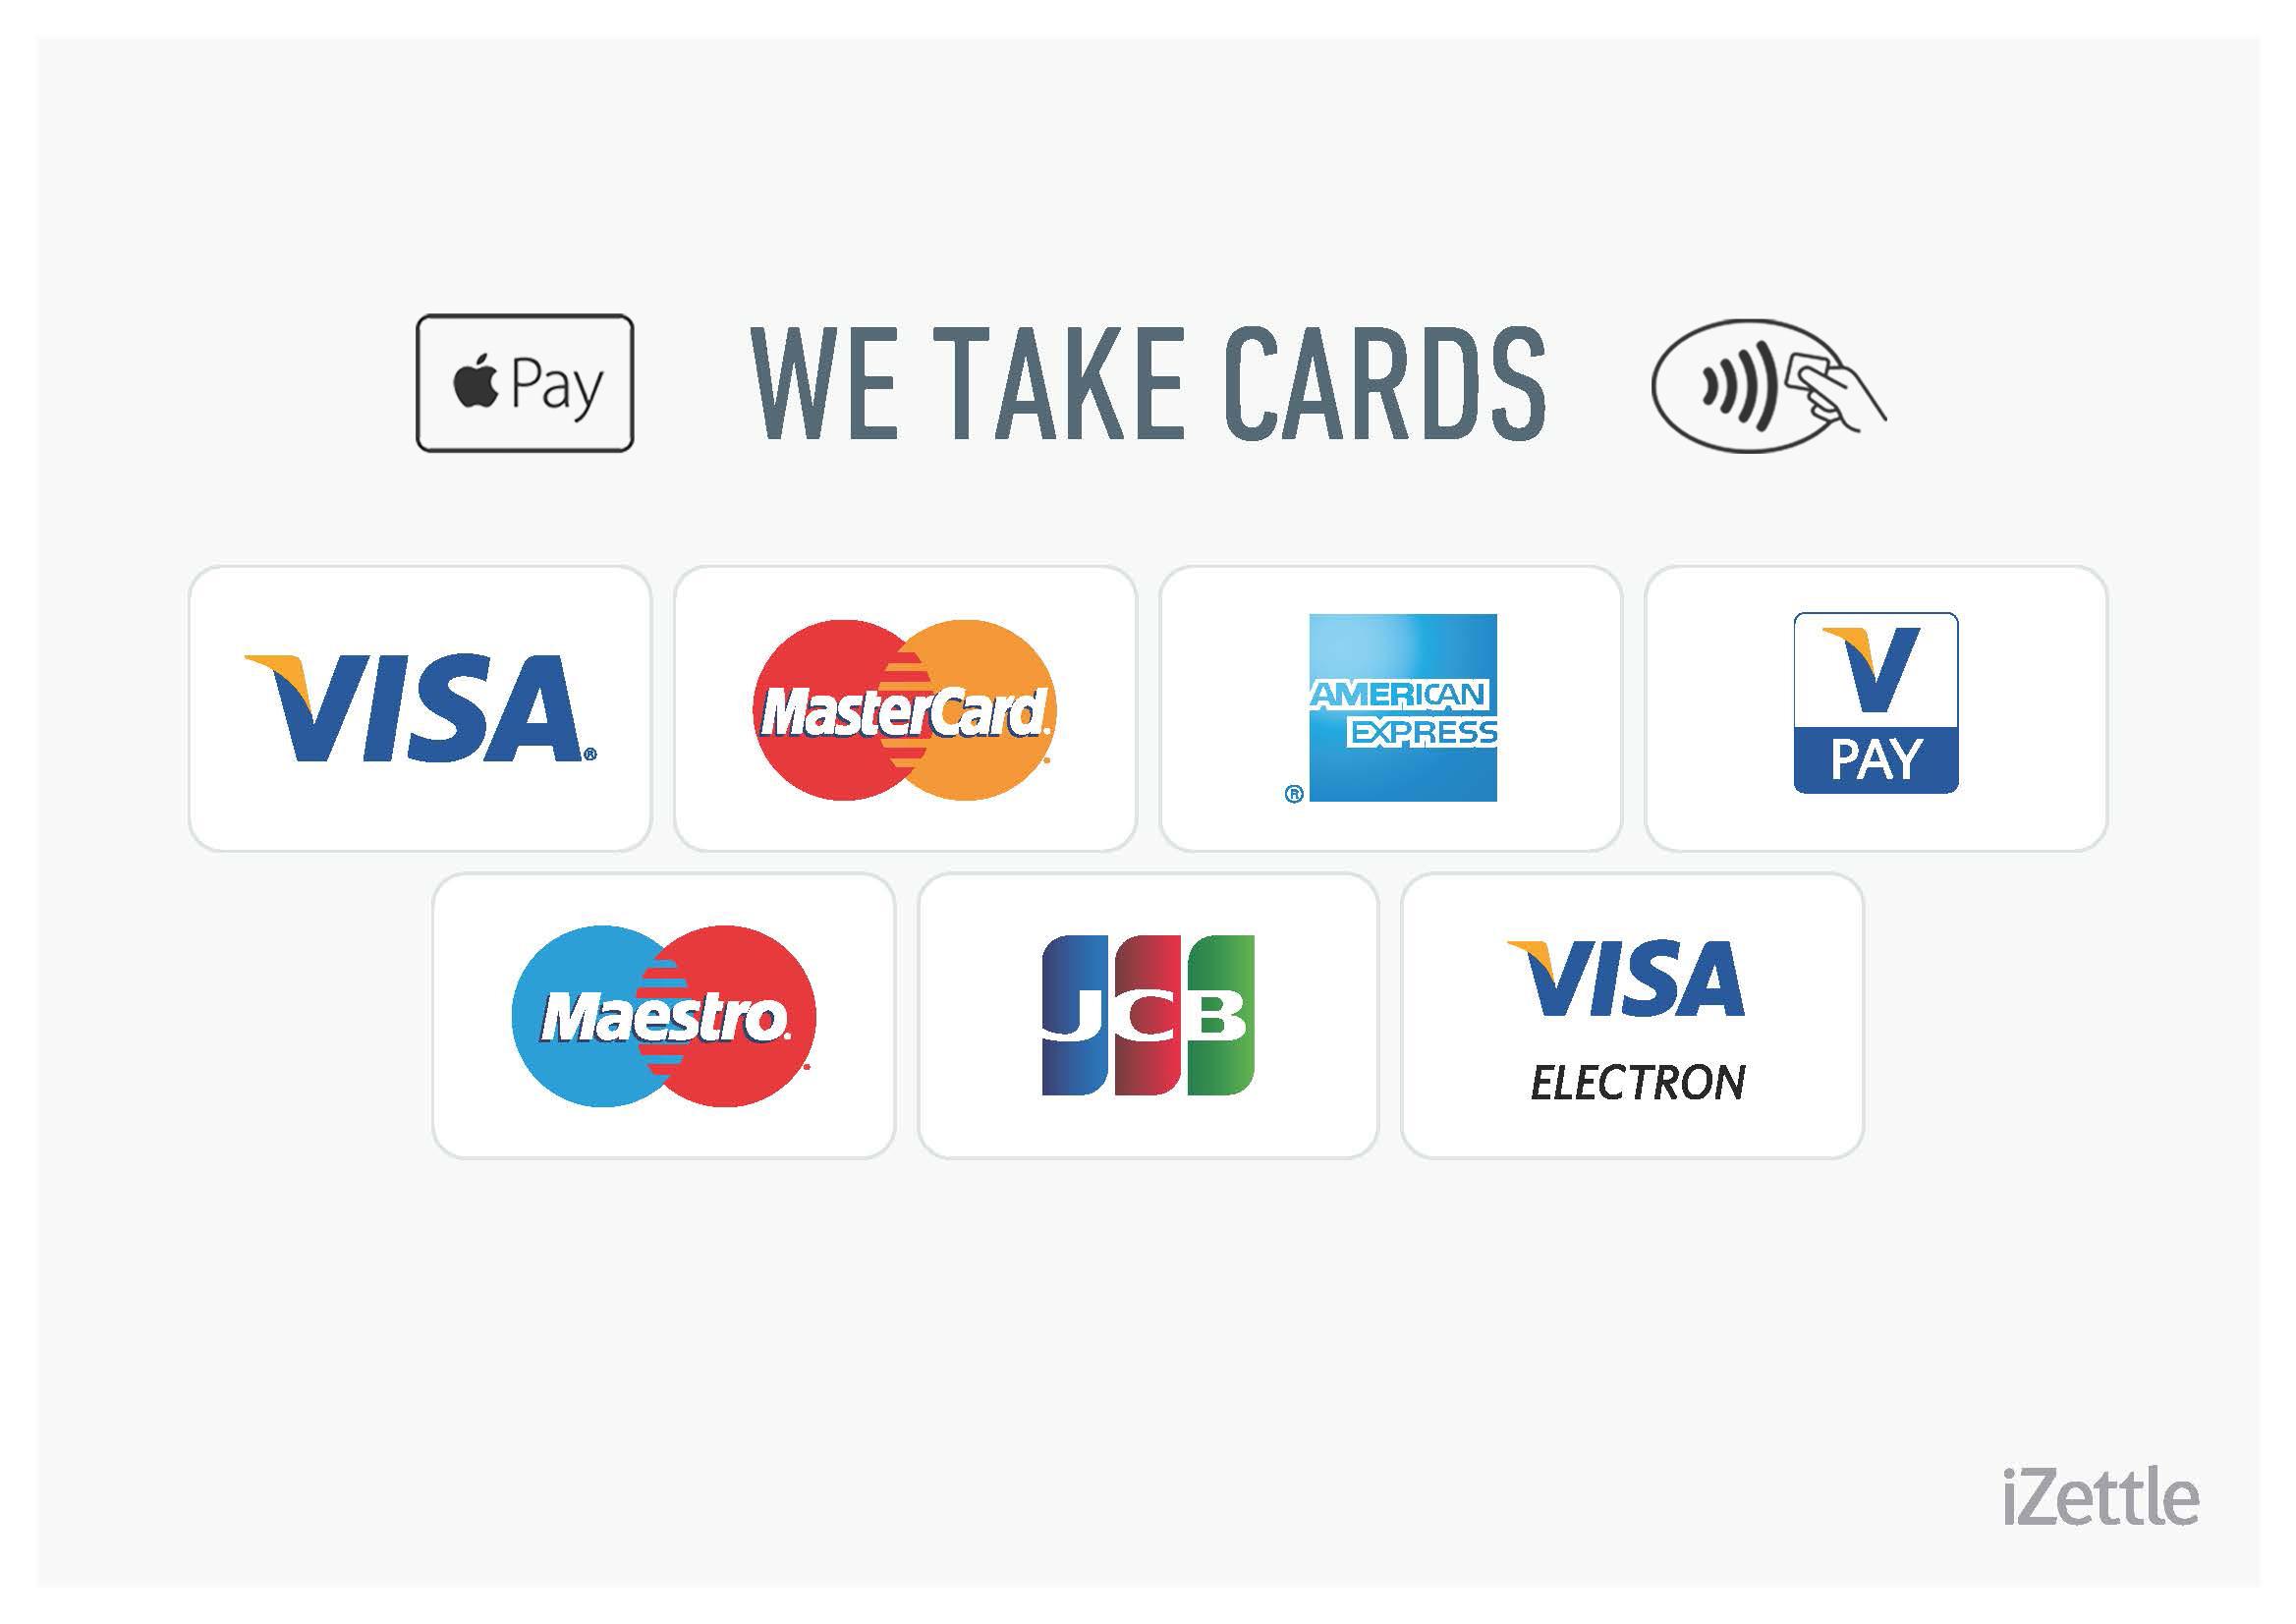 amazon visa credit card payment photo - 1